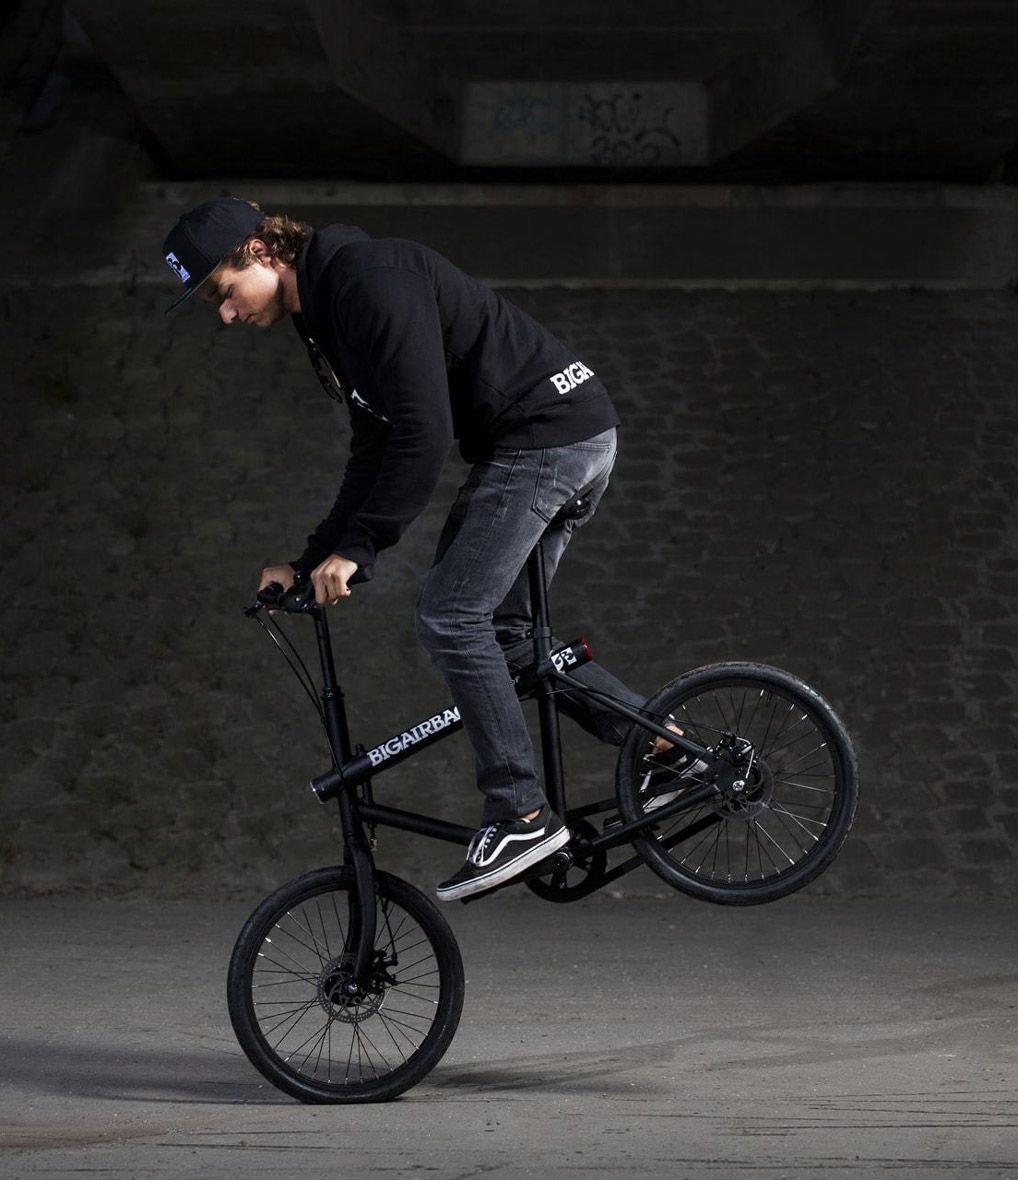 vanmoof electric bicycle